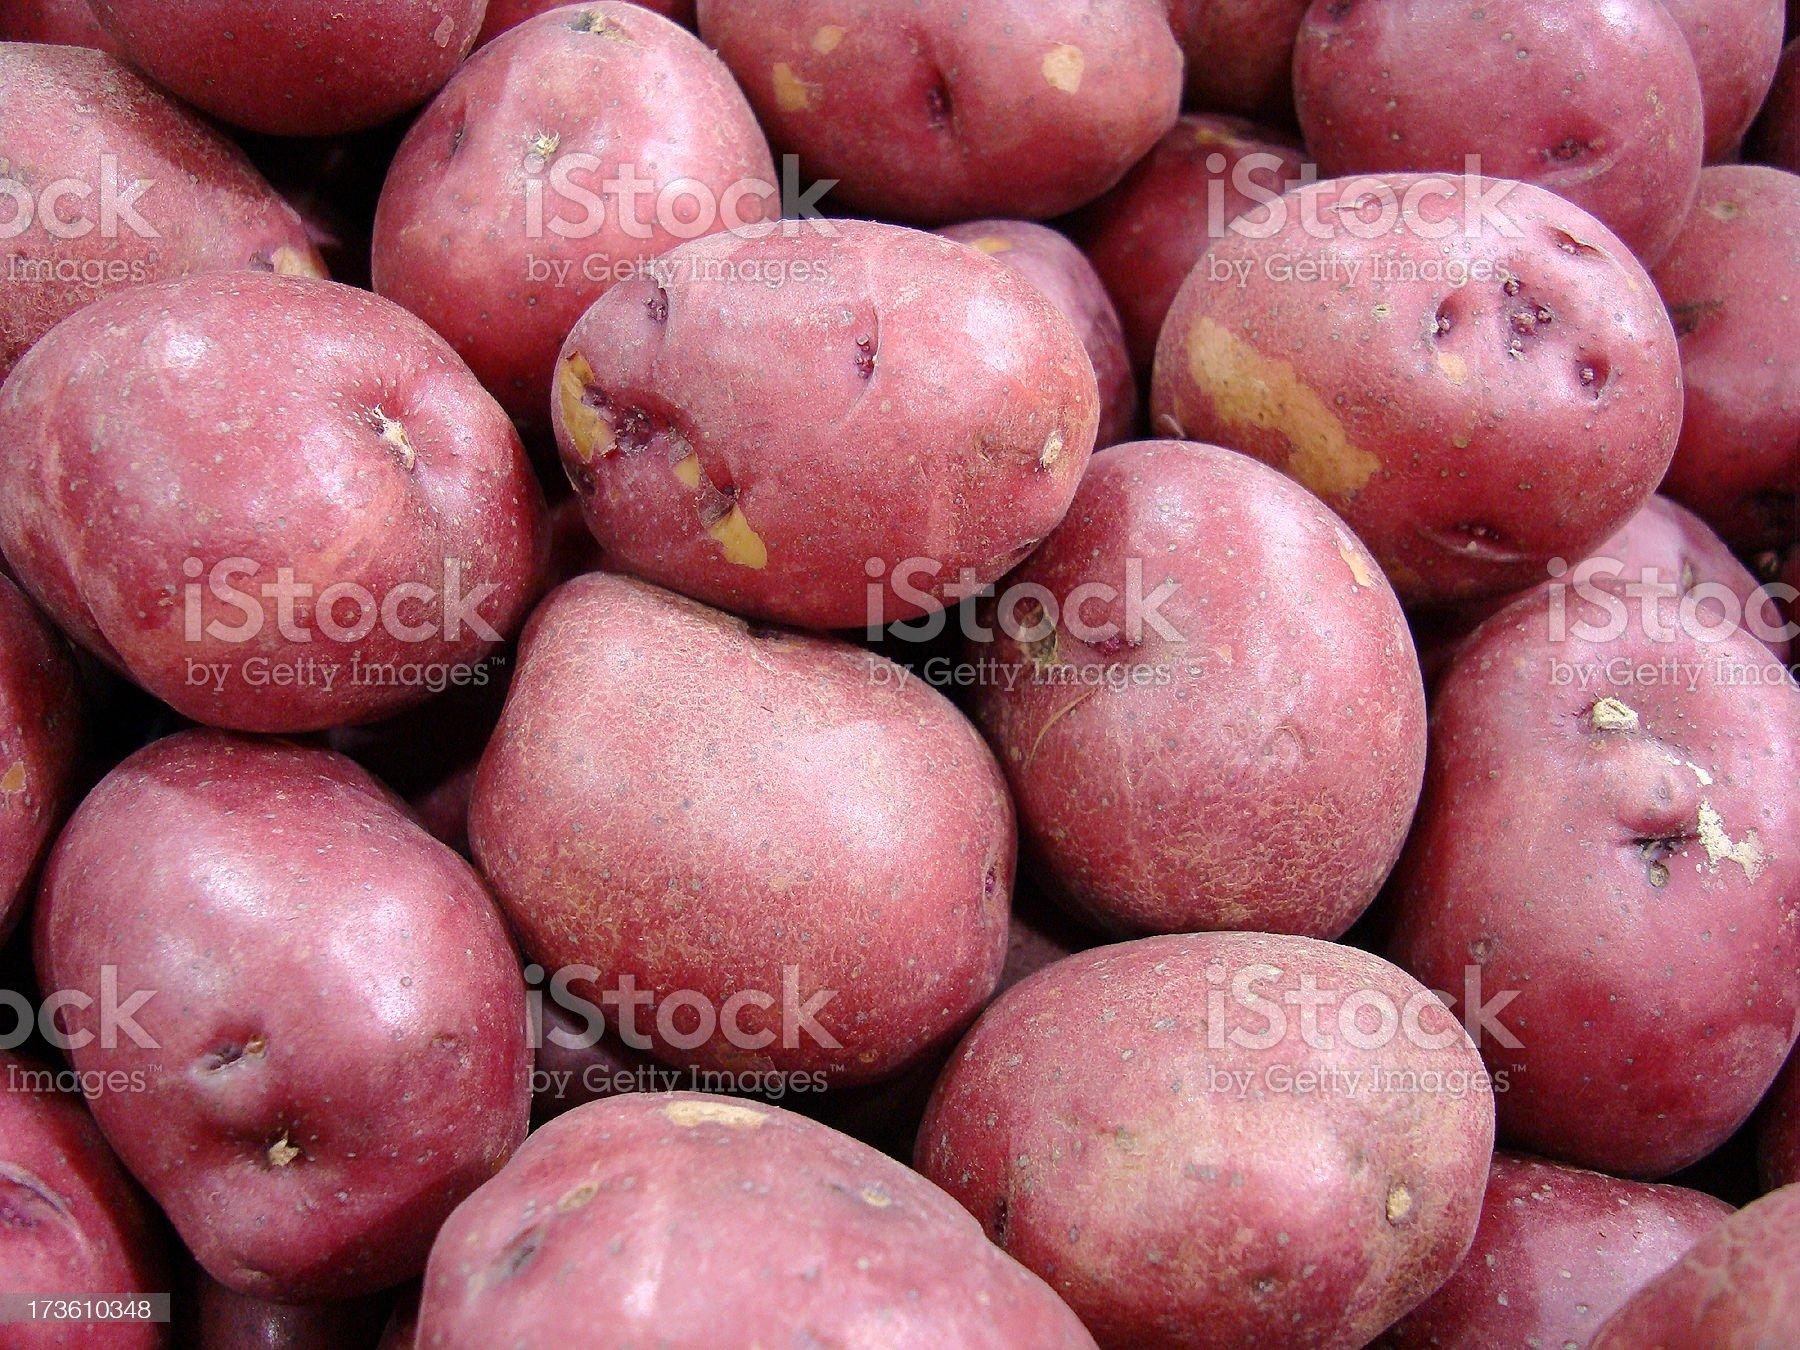 Red Bliss Potatos royalty-free stock photo